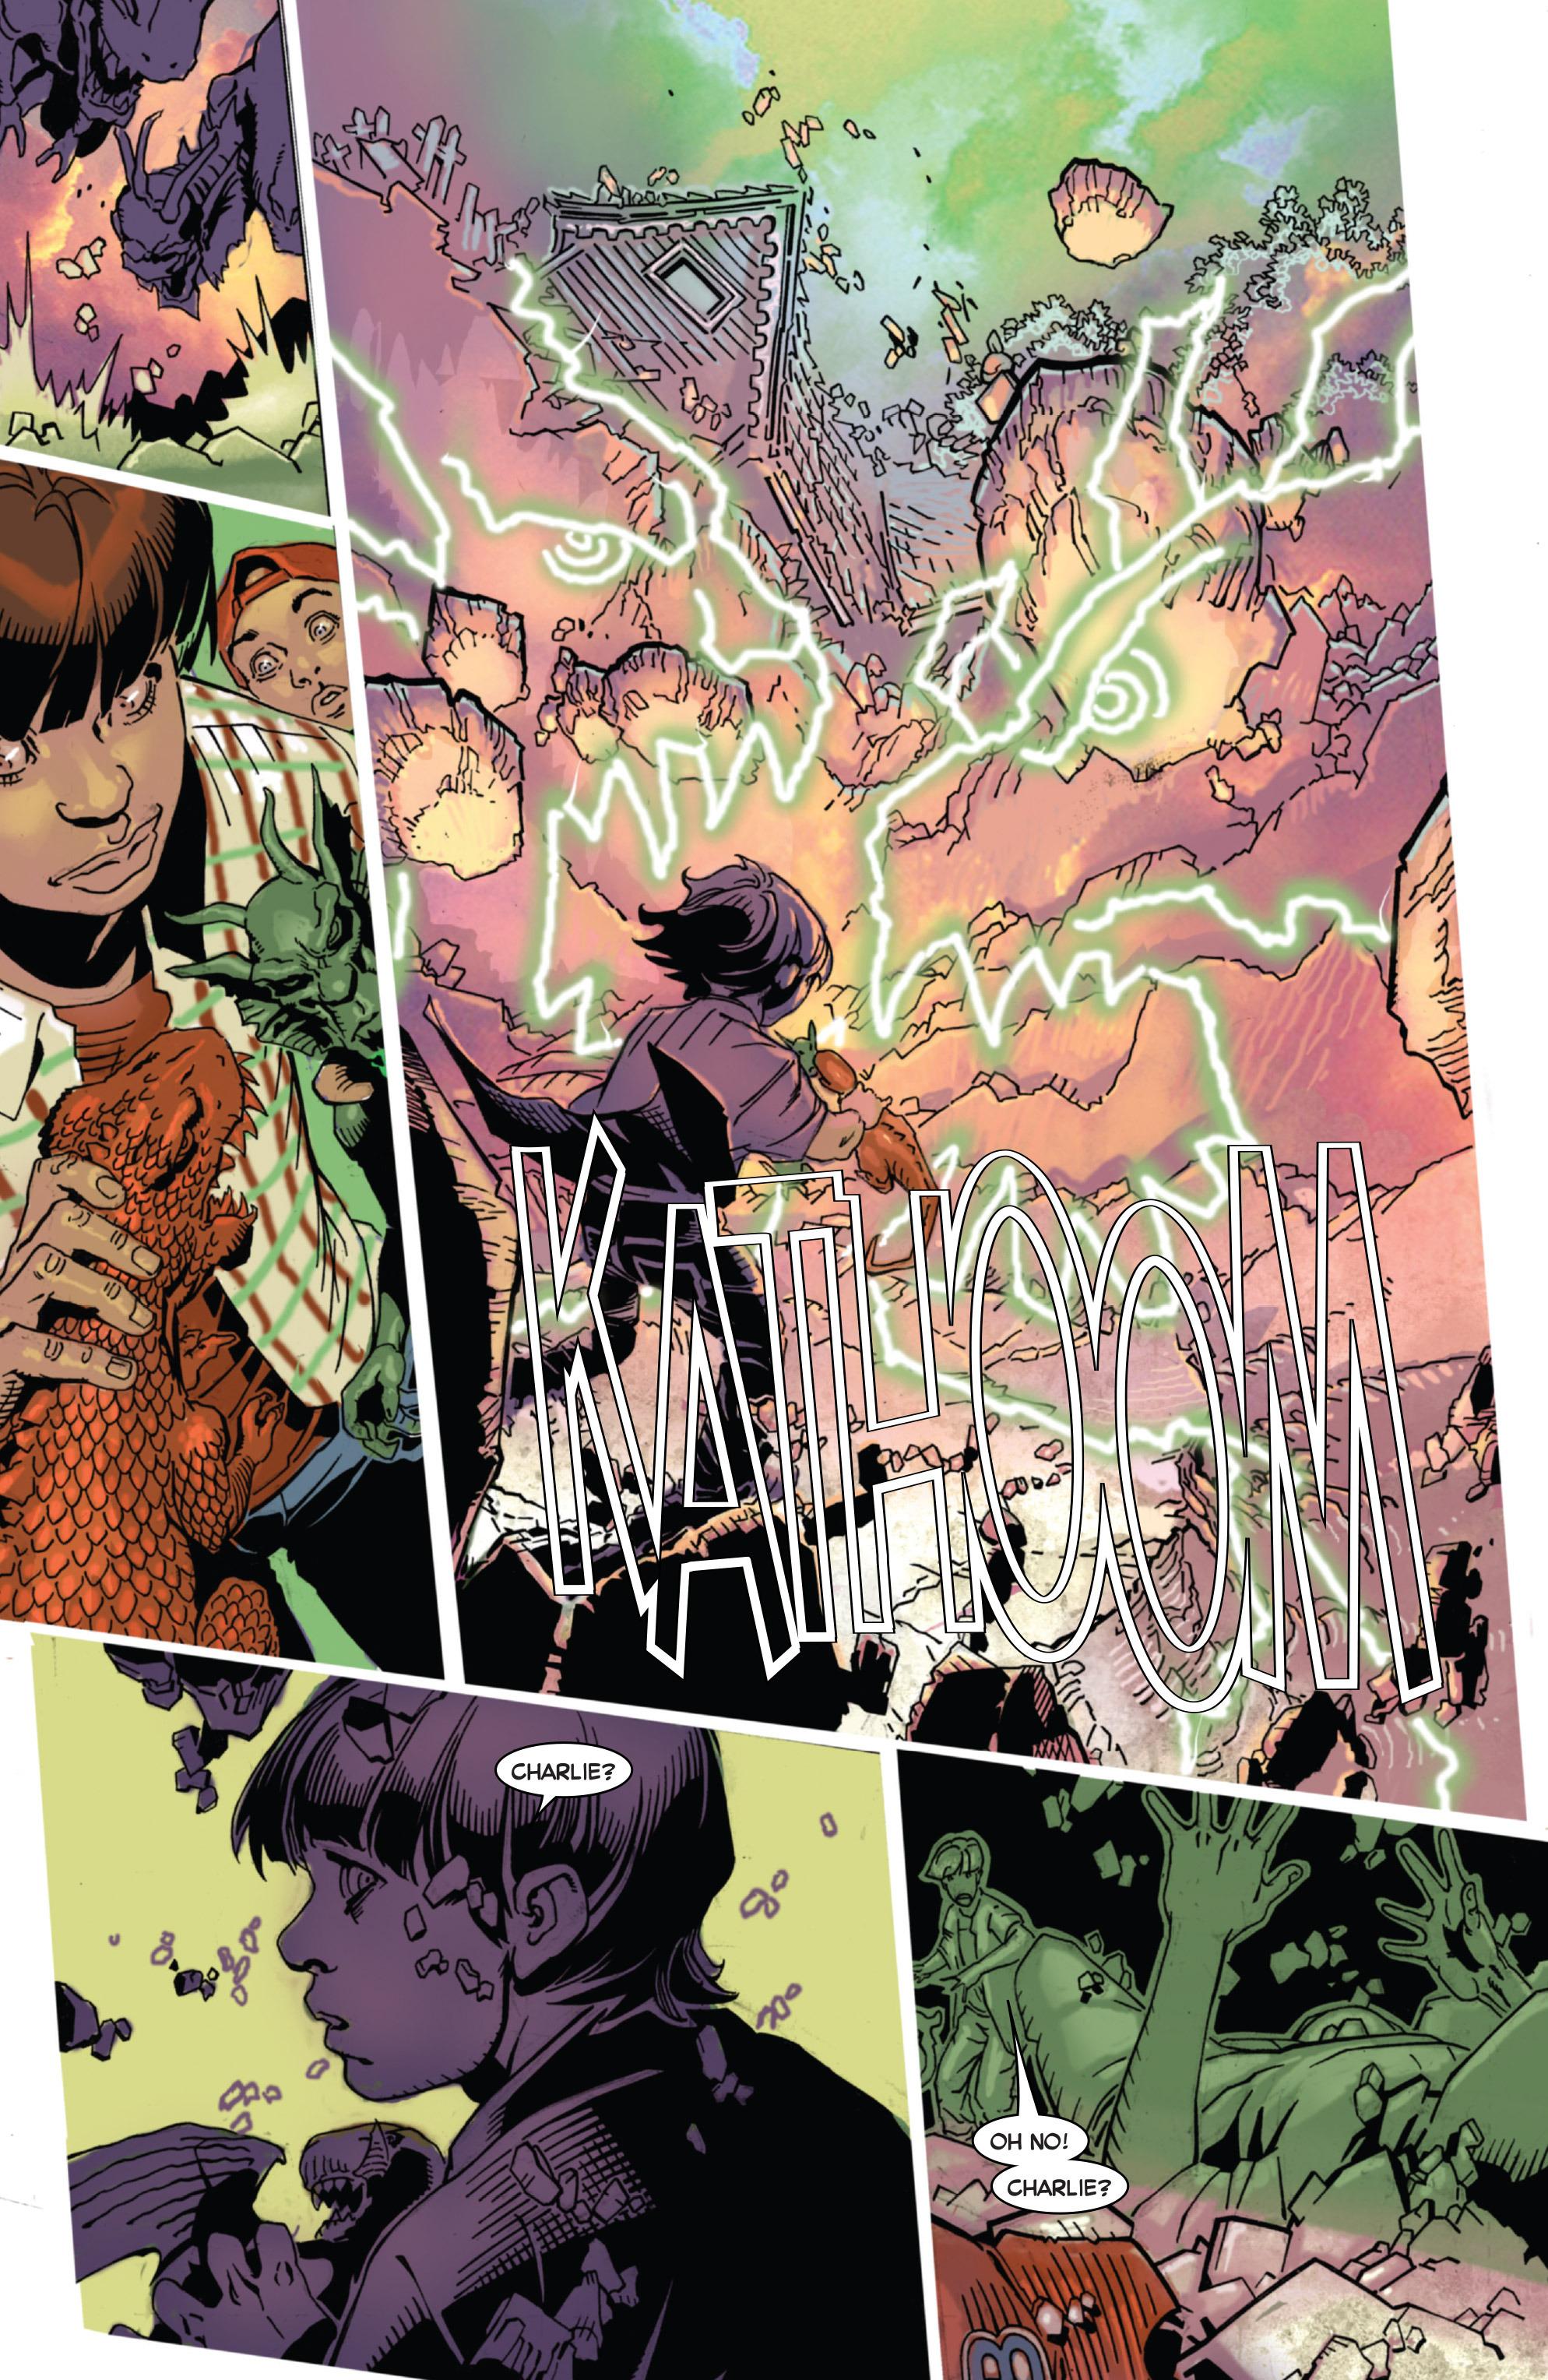 Read online Uncanny X-Men (2013) comic -  Issue # _TPB 4 - vs. S.H.I.E.L.D - 130